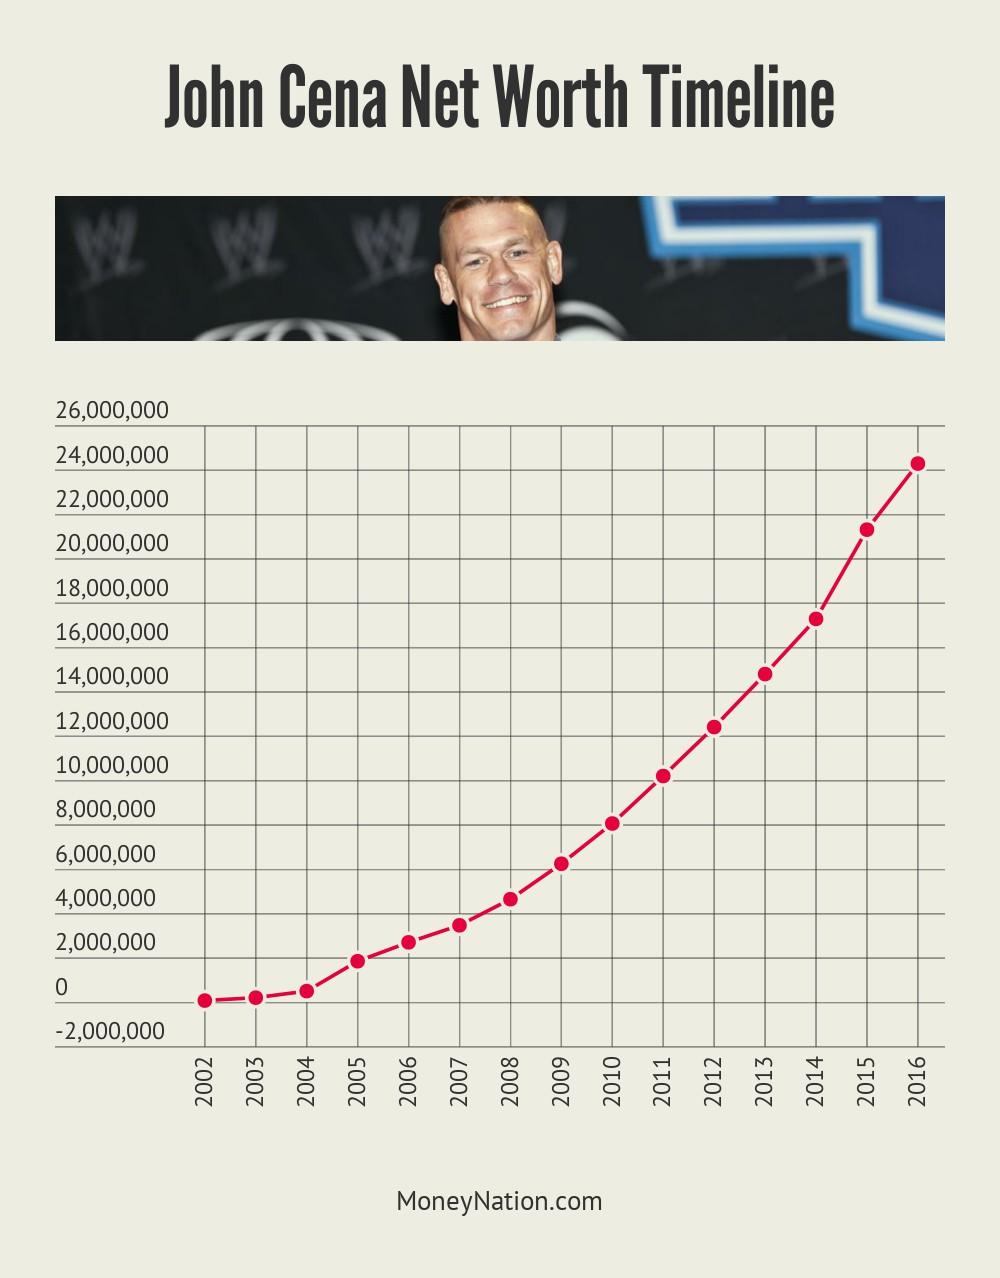 John Cena Net Worth Timeline